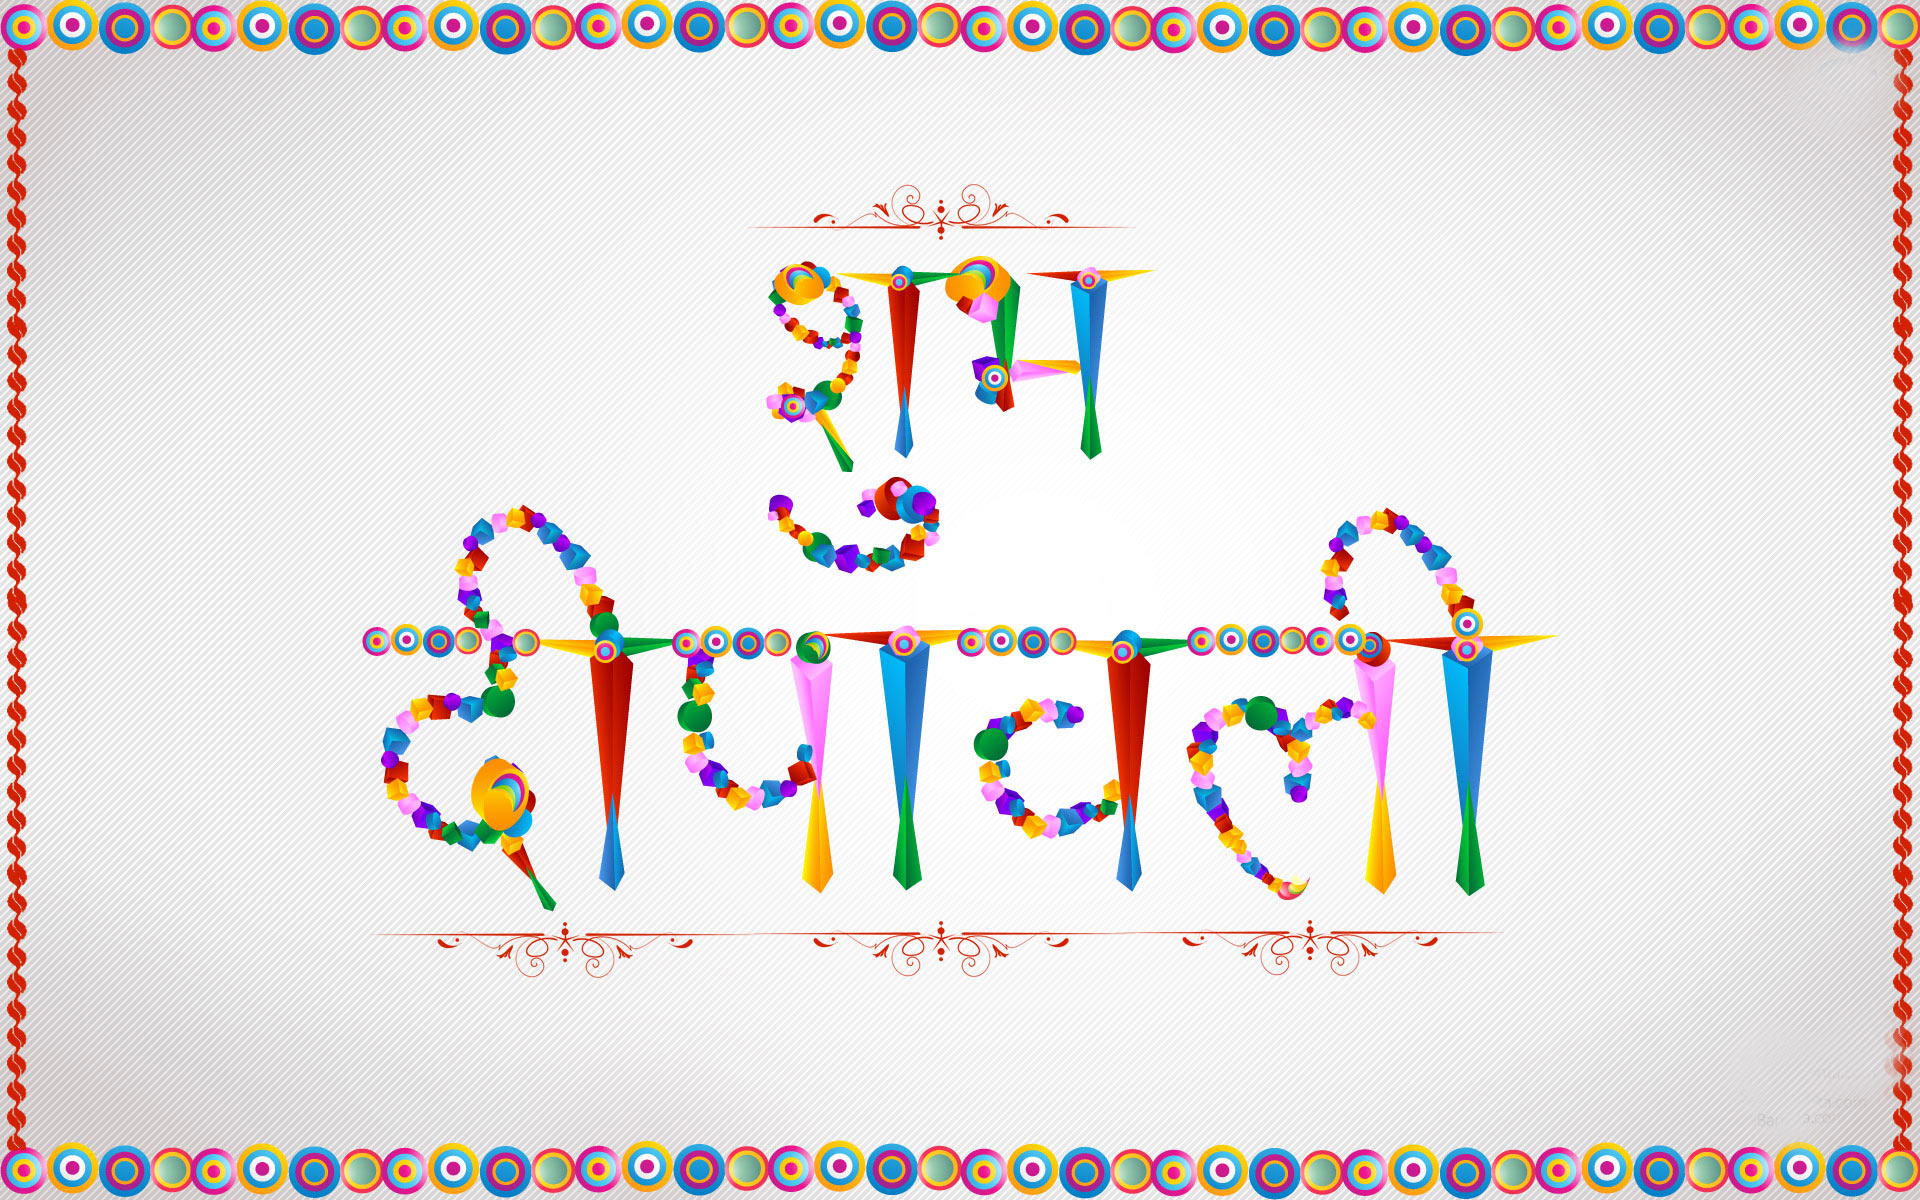 Shubh Deepawali Wishes